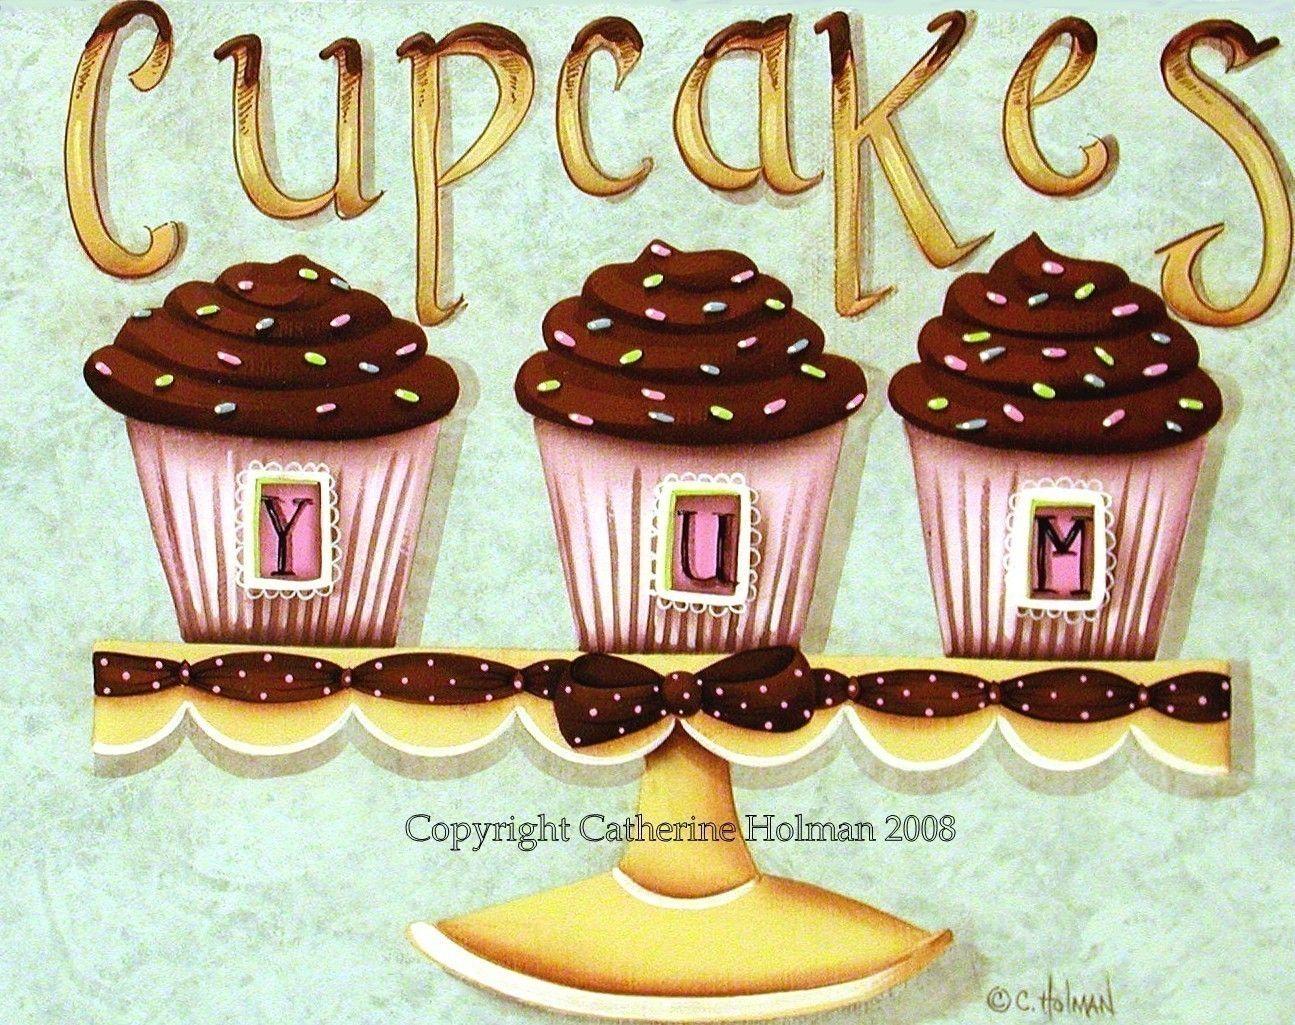 Folk Art Prints | Cupcake Yum Folk Art Print by catherineholman on Etsy